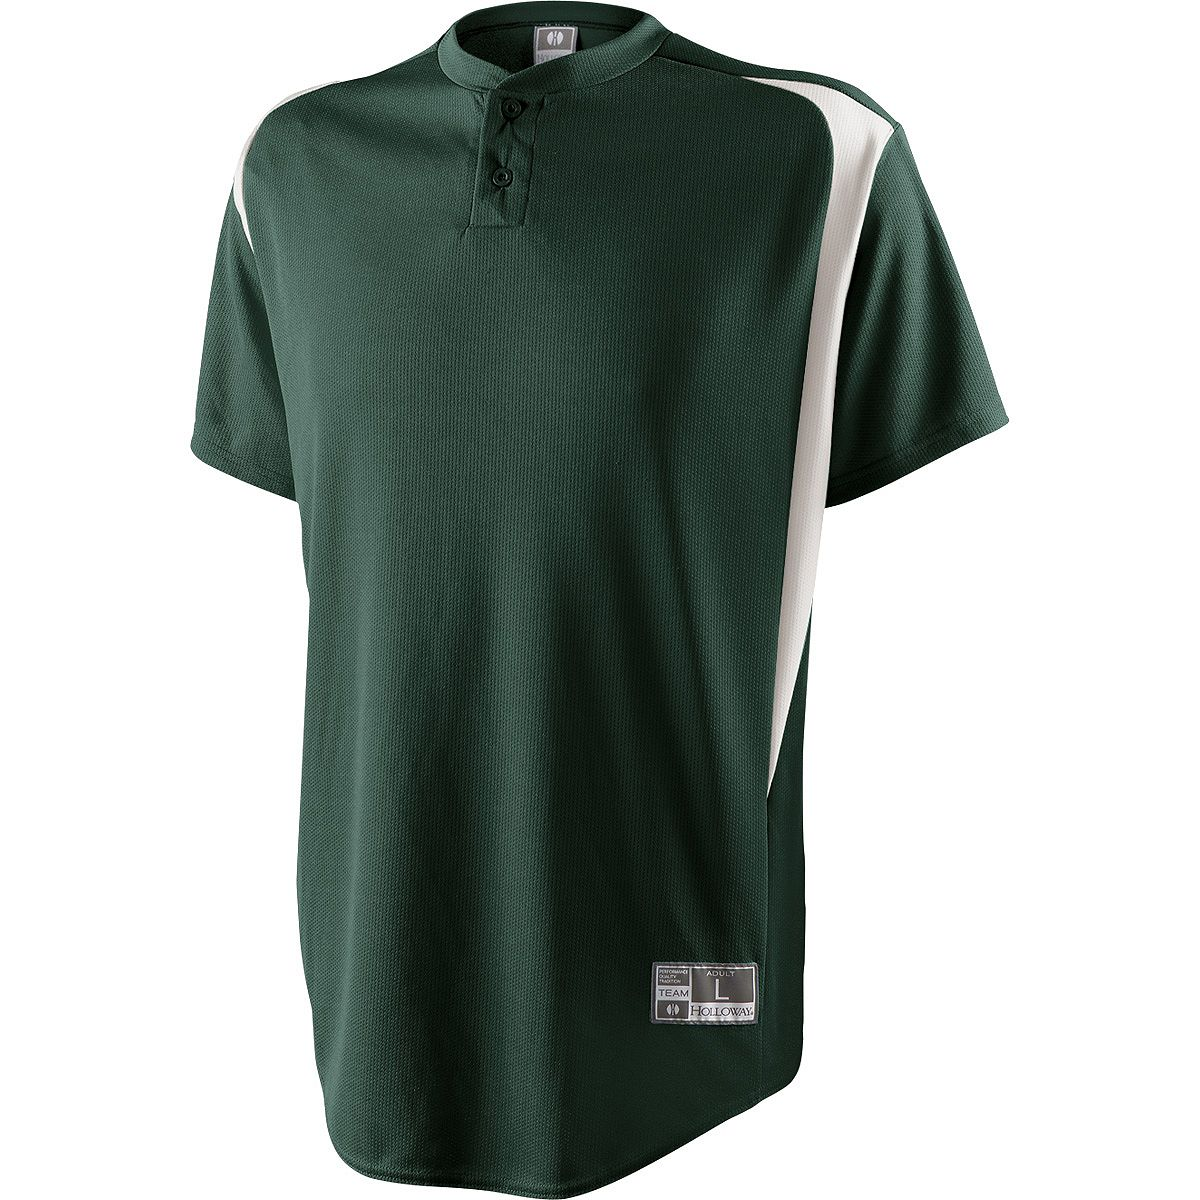 Holloway Razor Pin-Dot Jersey For/Whi S - image 1 de 1